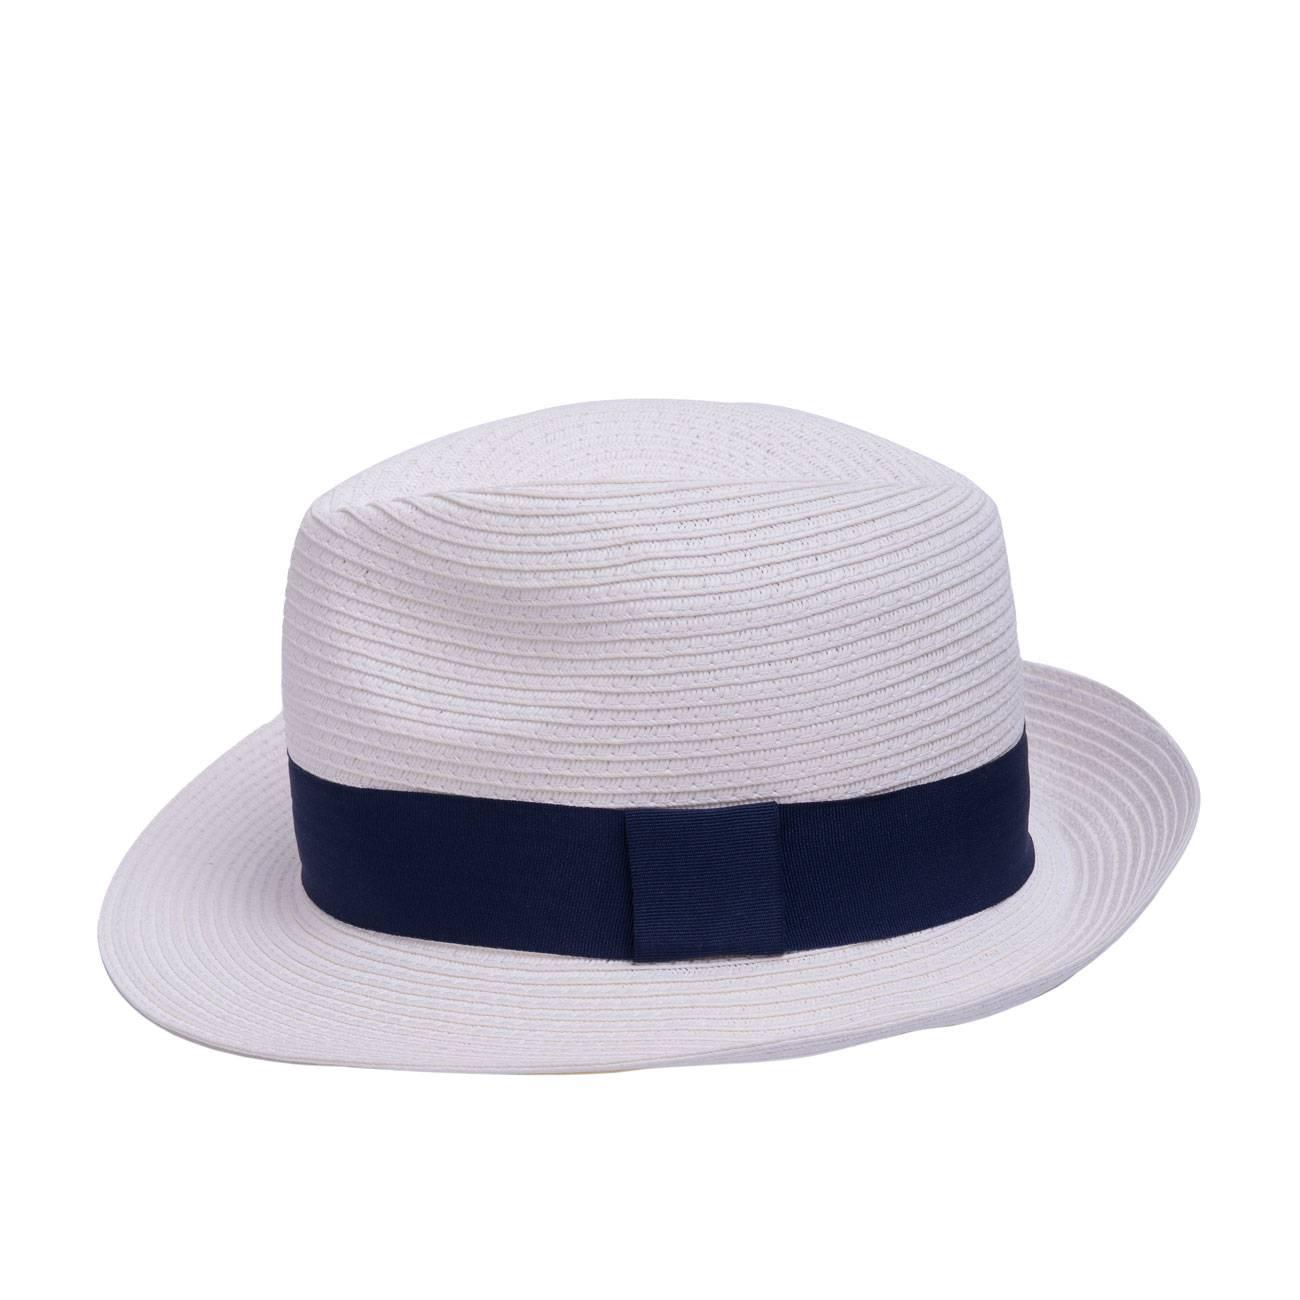 Panama Hat White imagine